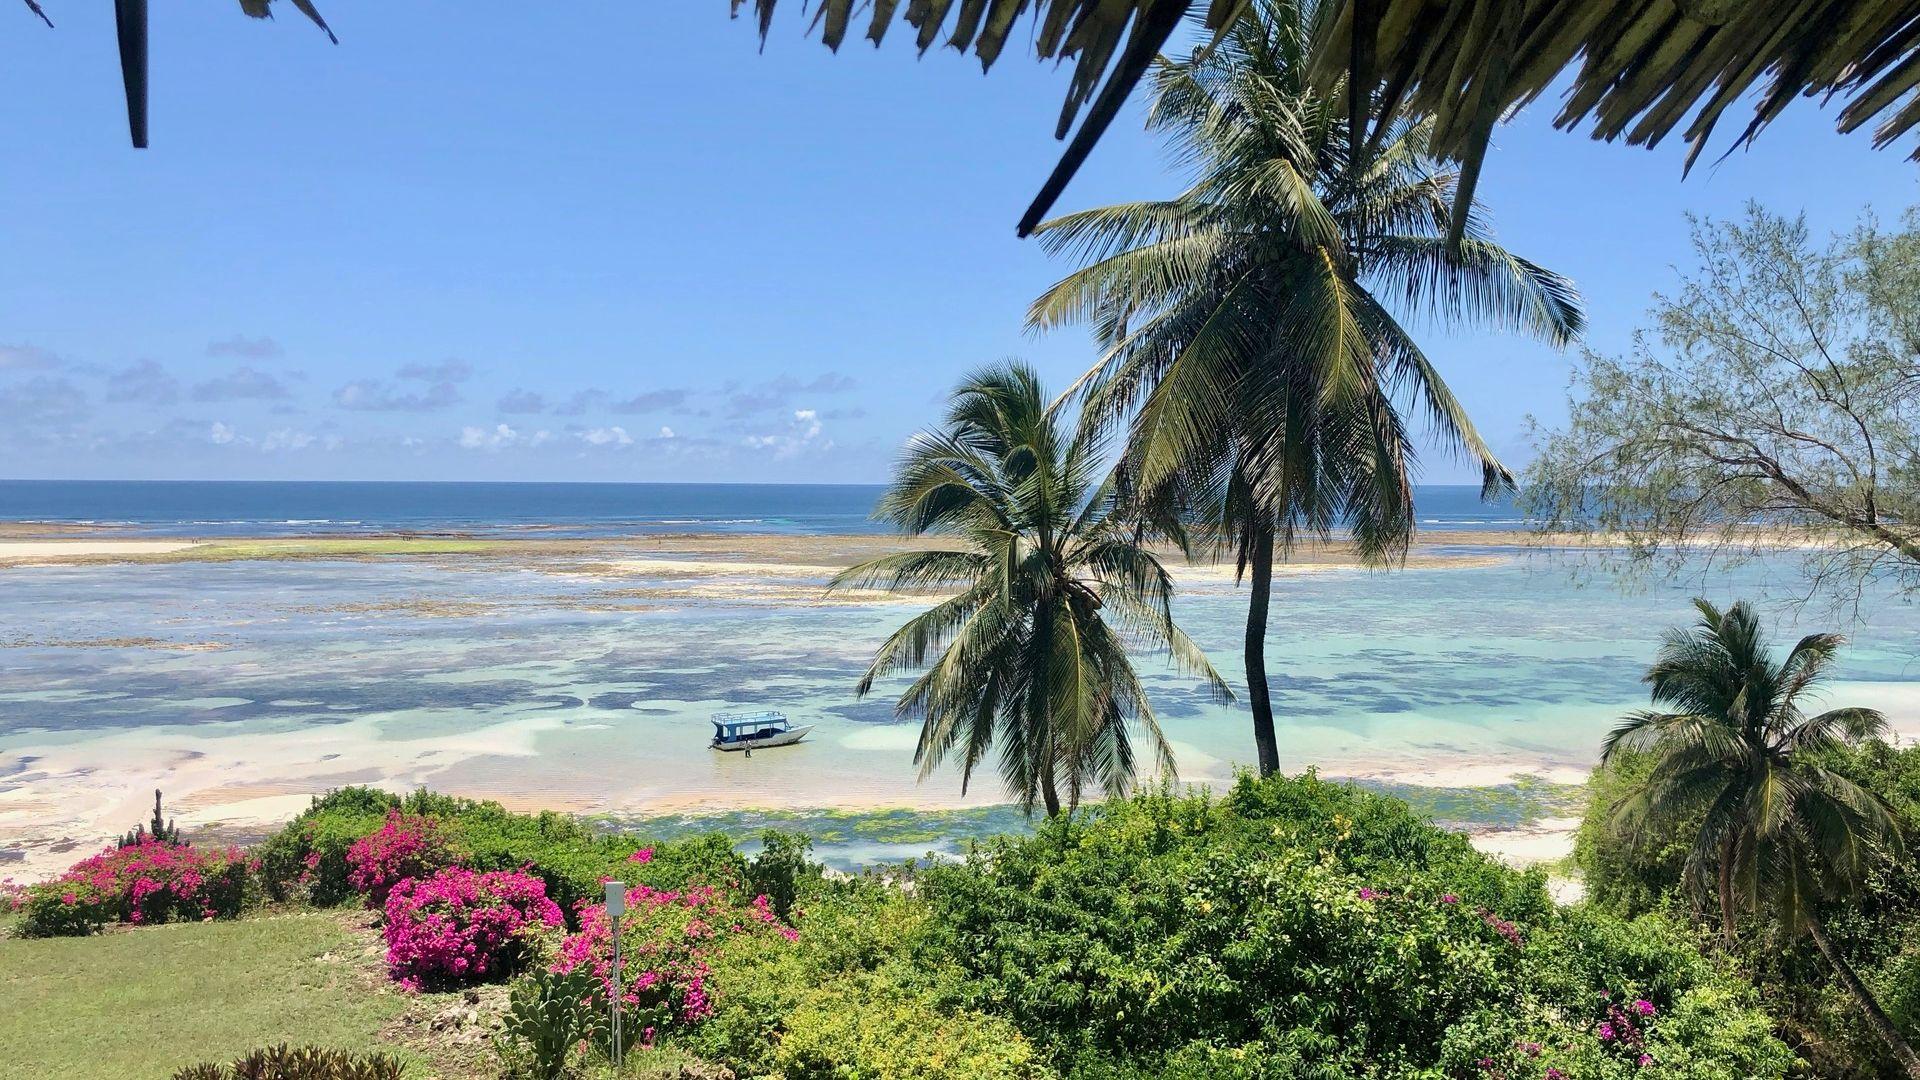 Craciun 2021 - Sejur charter all inclusive Malindi, Kenya, 9 zile